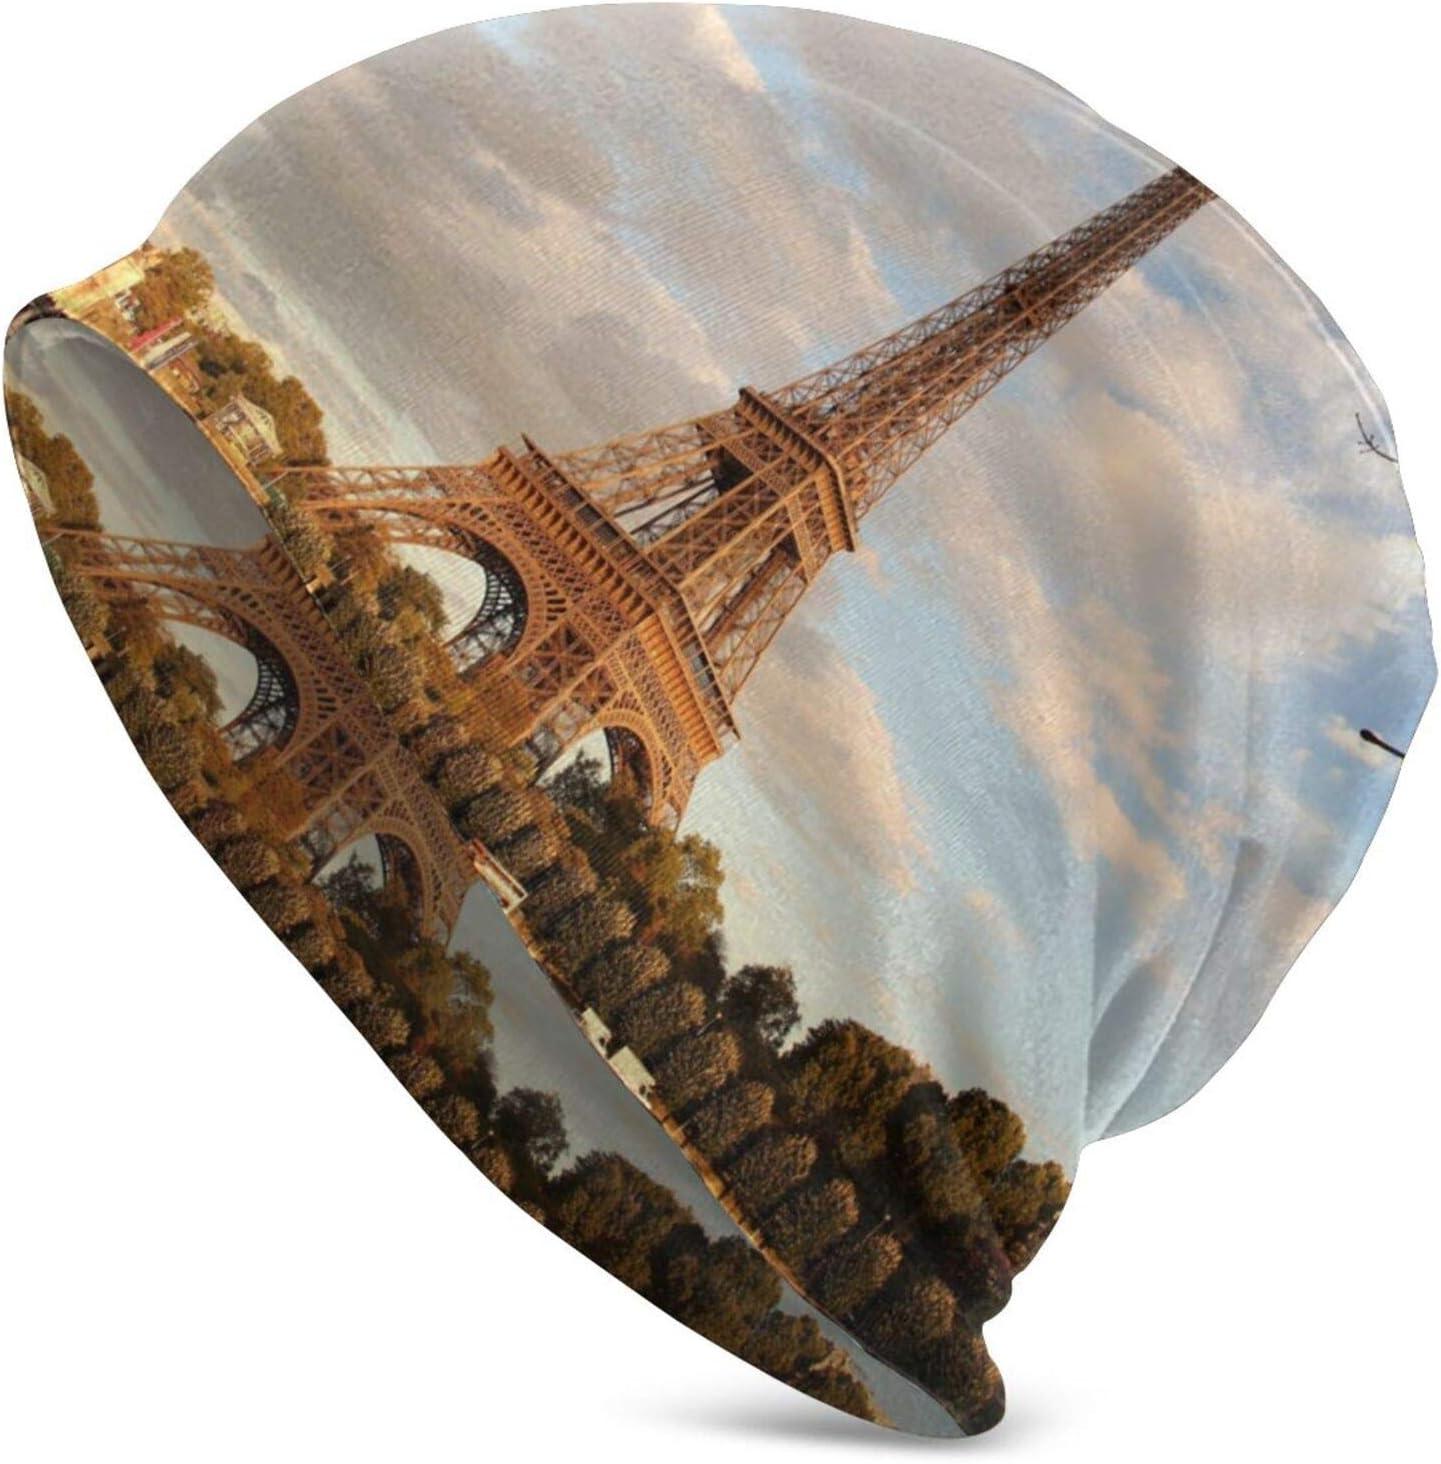 QUEMIN Bolsa Francia Otoño París Torre Ciudades Paisaje Mar Agua Naturaleza Exterior Océano Calavera Gorro Beanie elástico Gorras holgadas Invierno Tejido Moda Sombreros para Mujeres Hombres